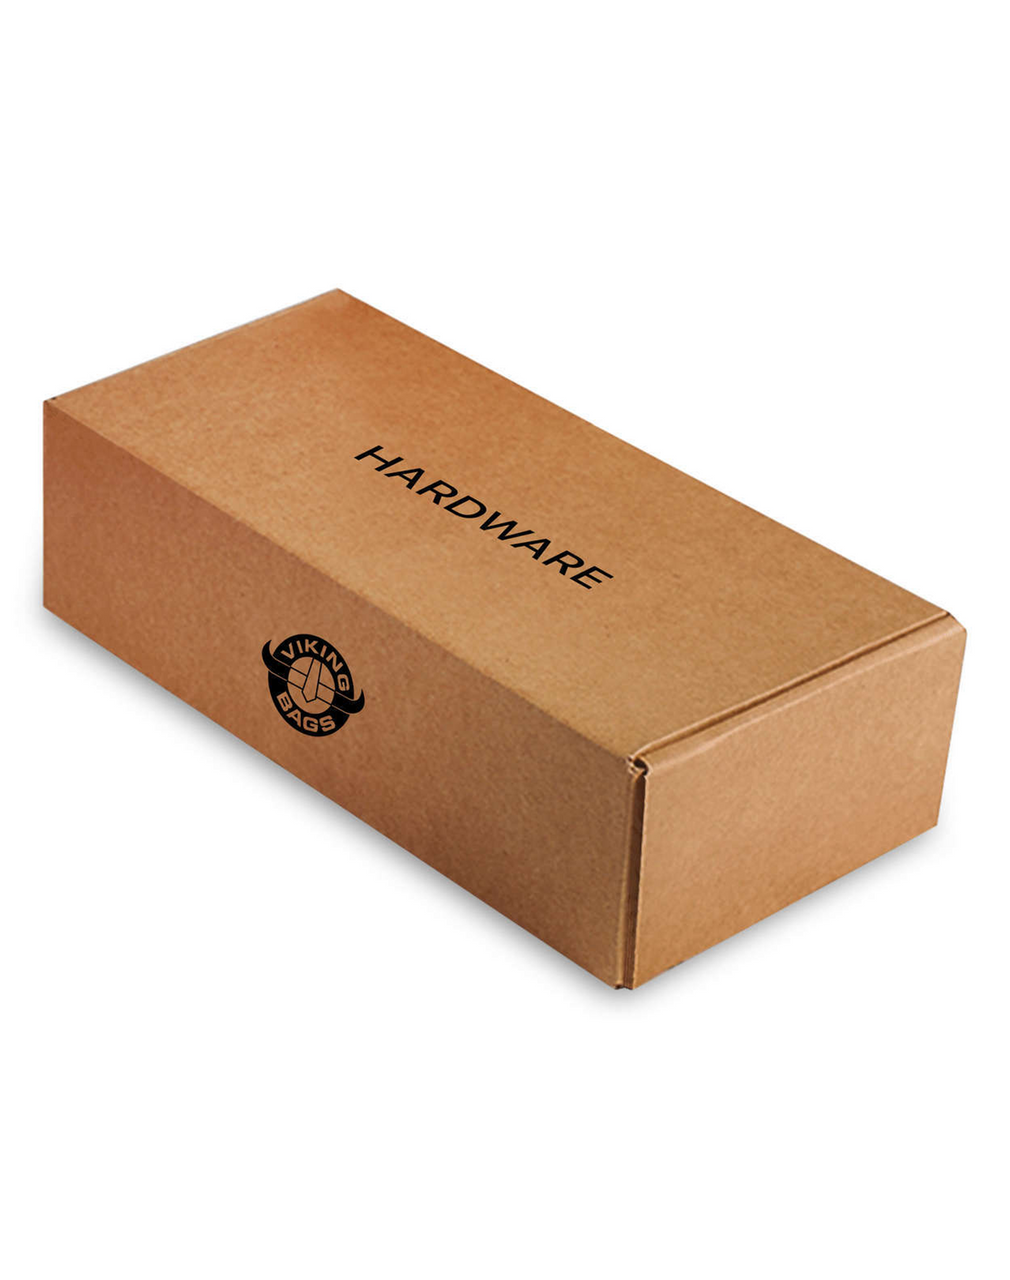 Honda 750 Shadow Aero Viking Lamellar Large Black Hard Saddlebags Box